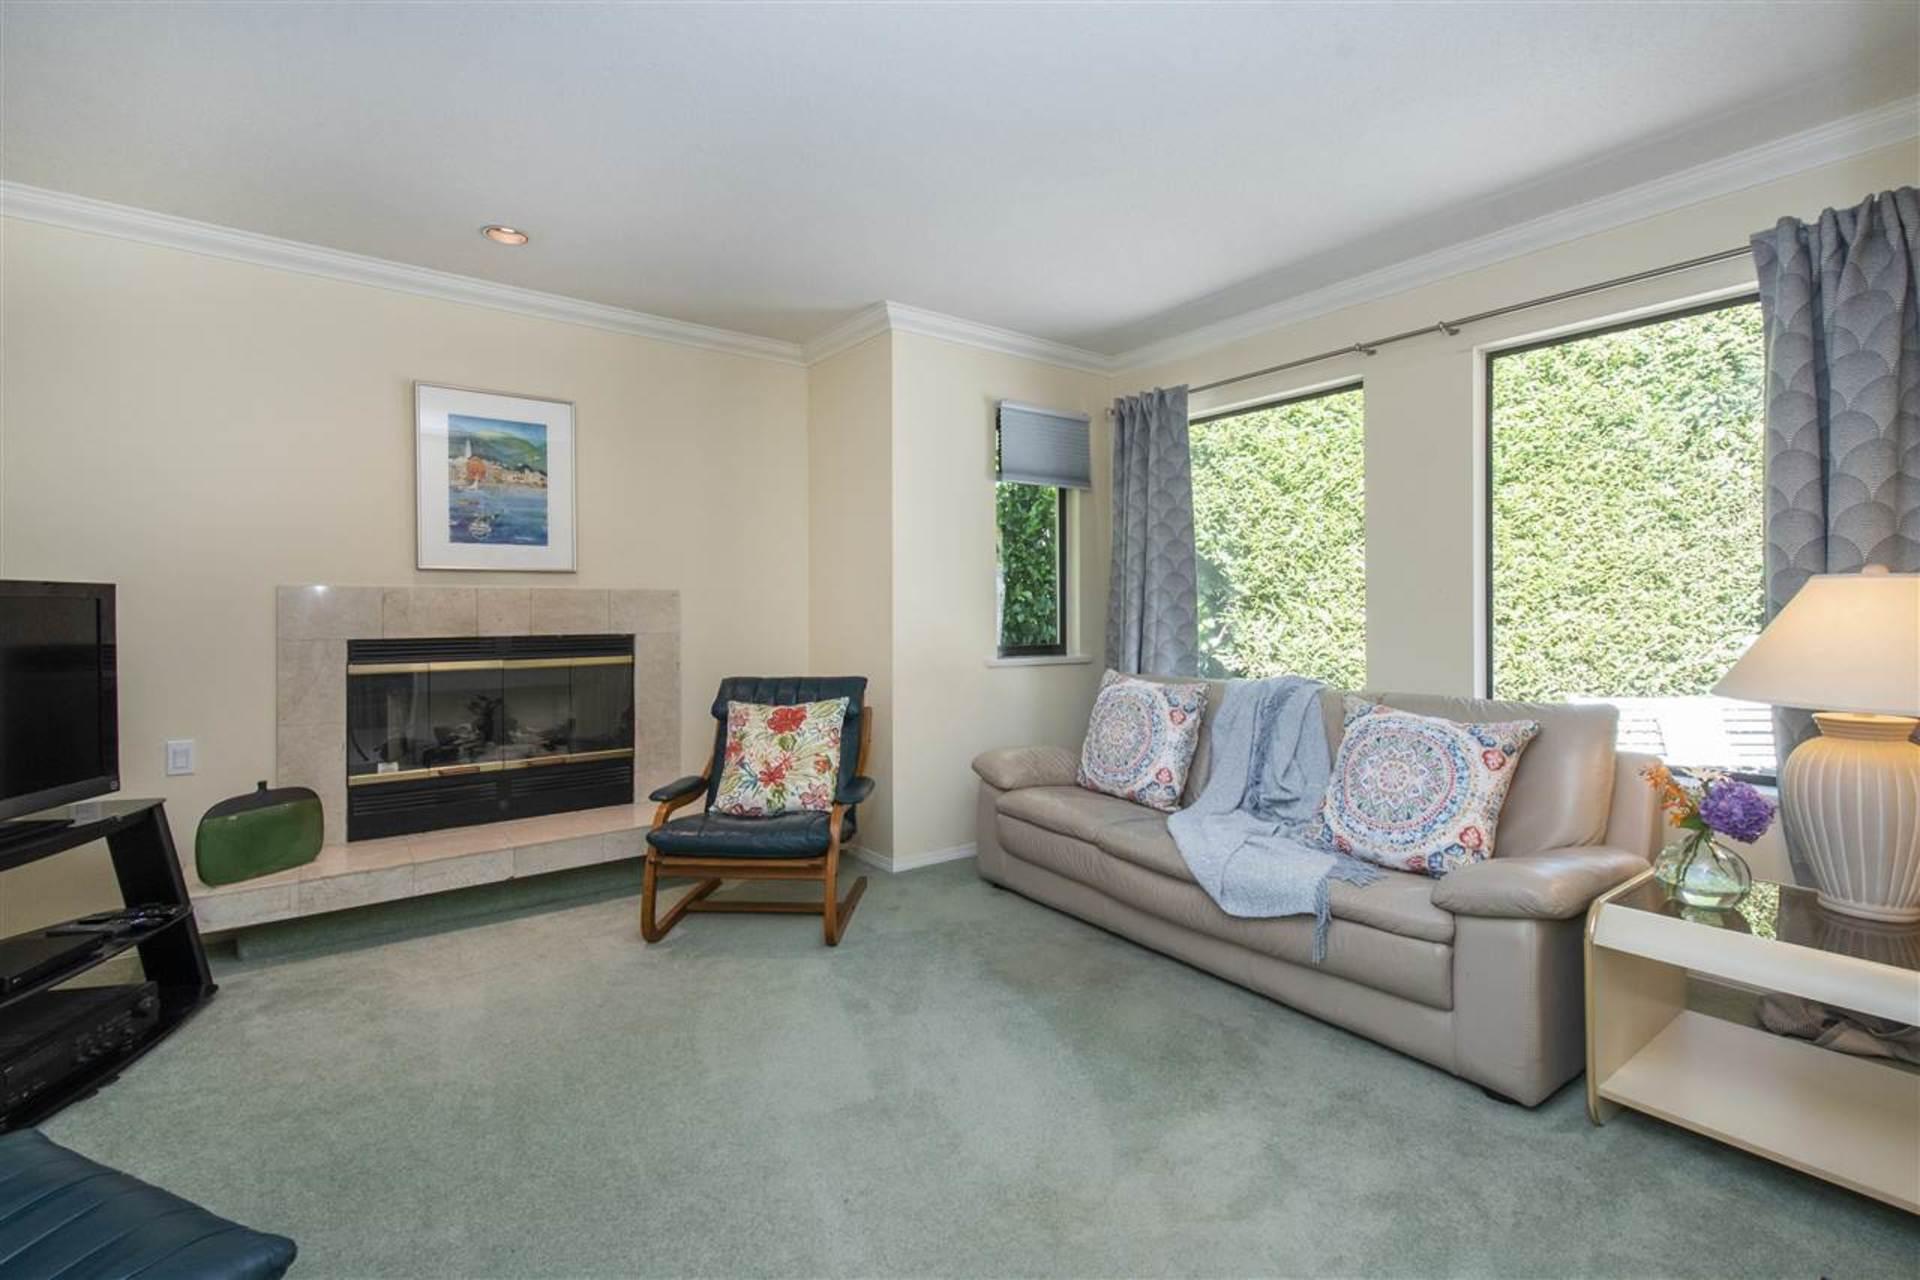 4285-prospect-road-upper-delbrook-north-vancouver-19 at 4285 Prospect Road, Upper Delbrook, North Vancouver